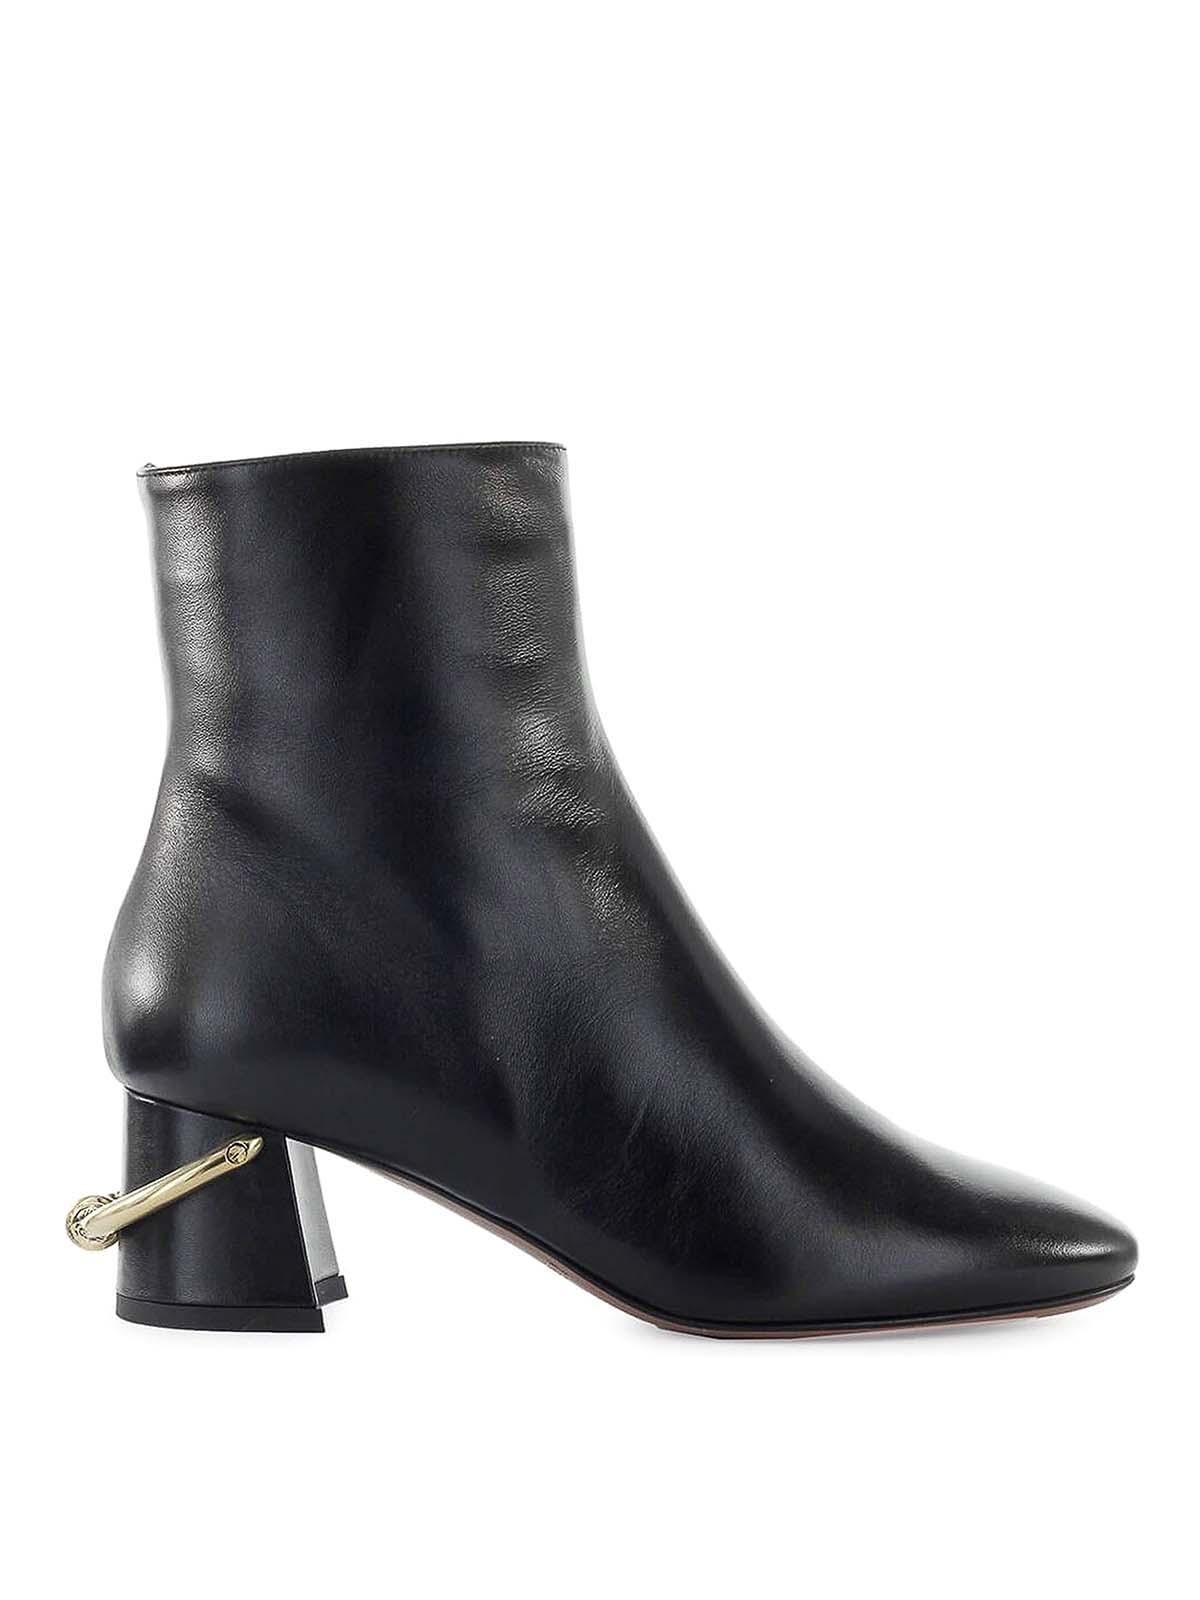 L'autre Chose Black Ankle Boot With